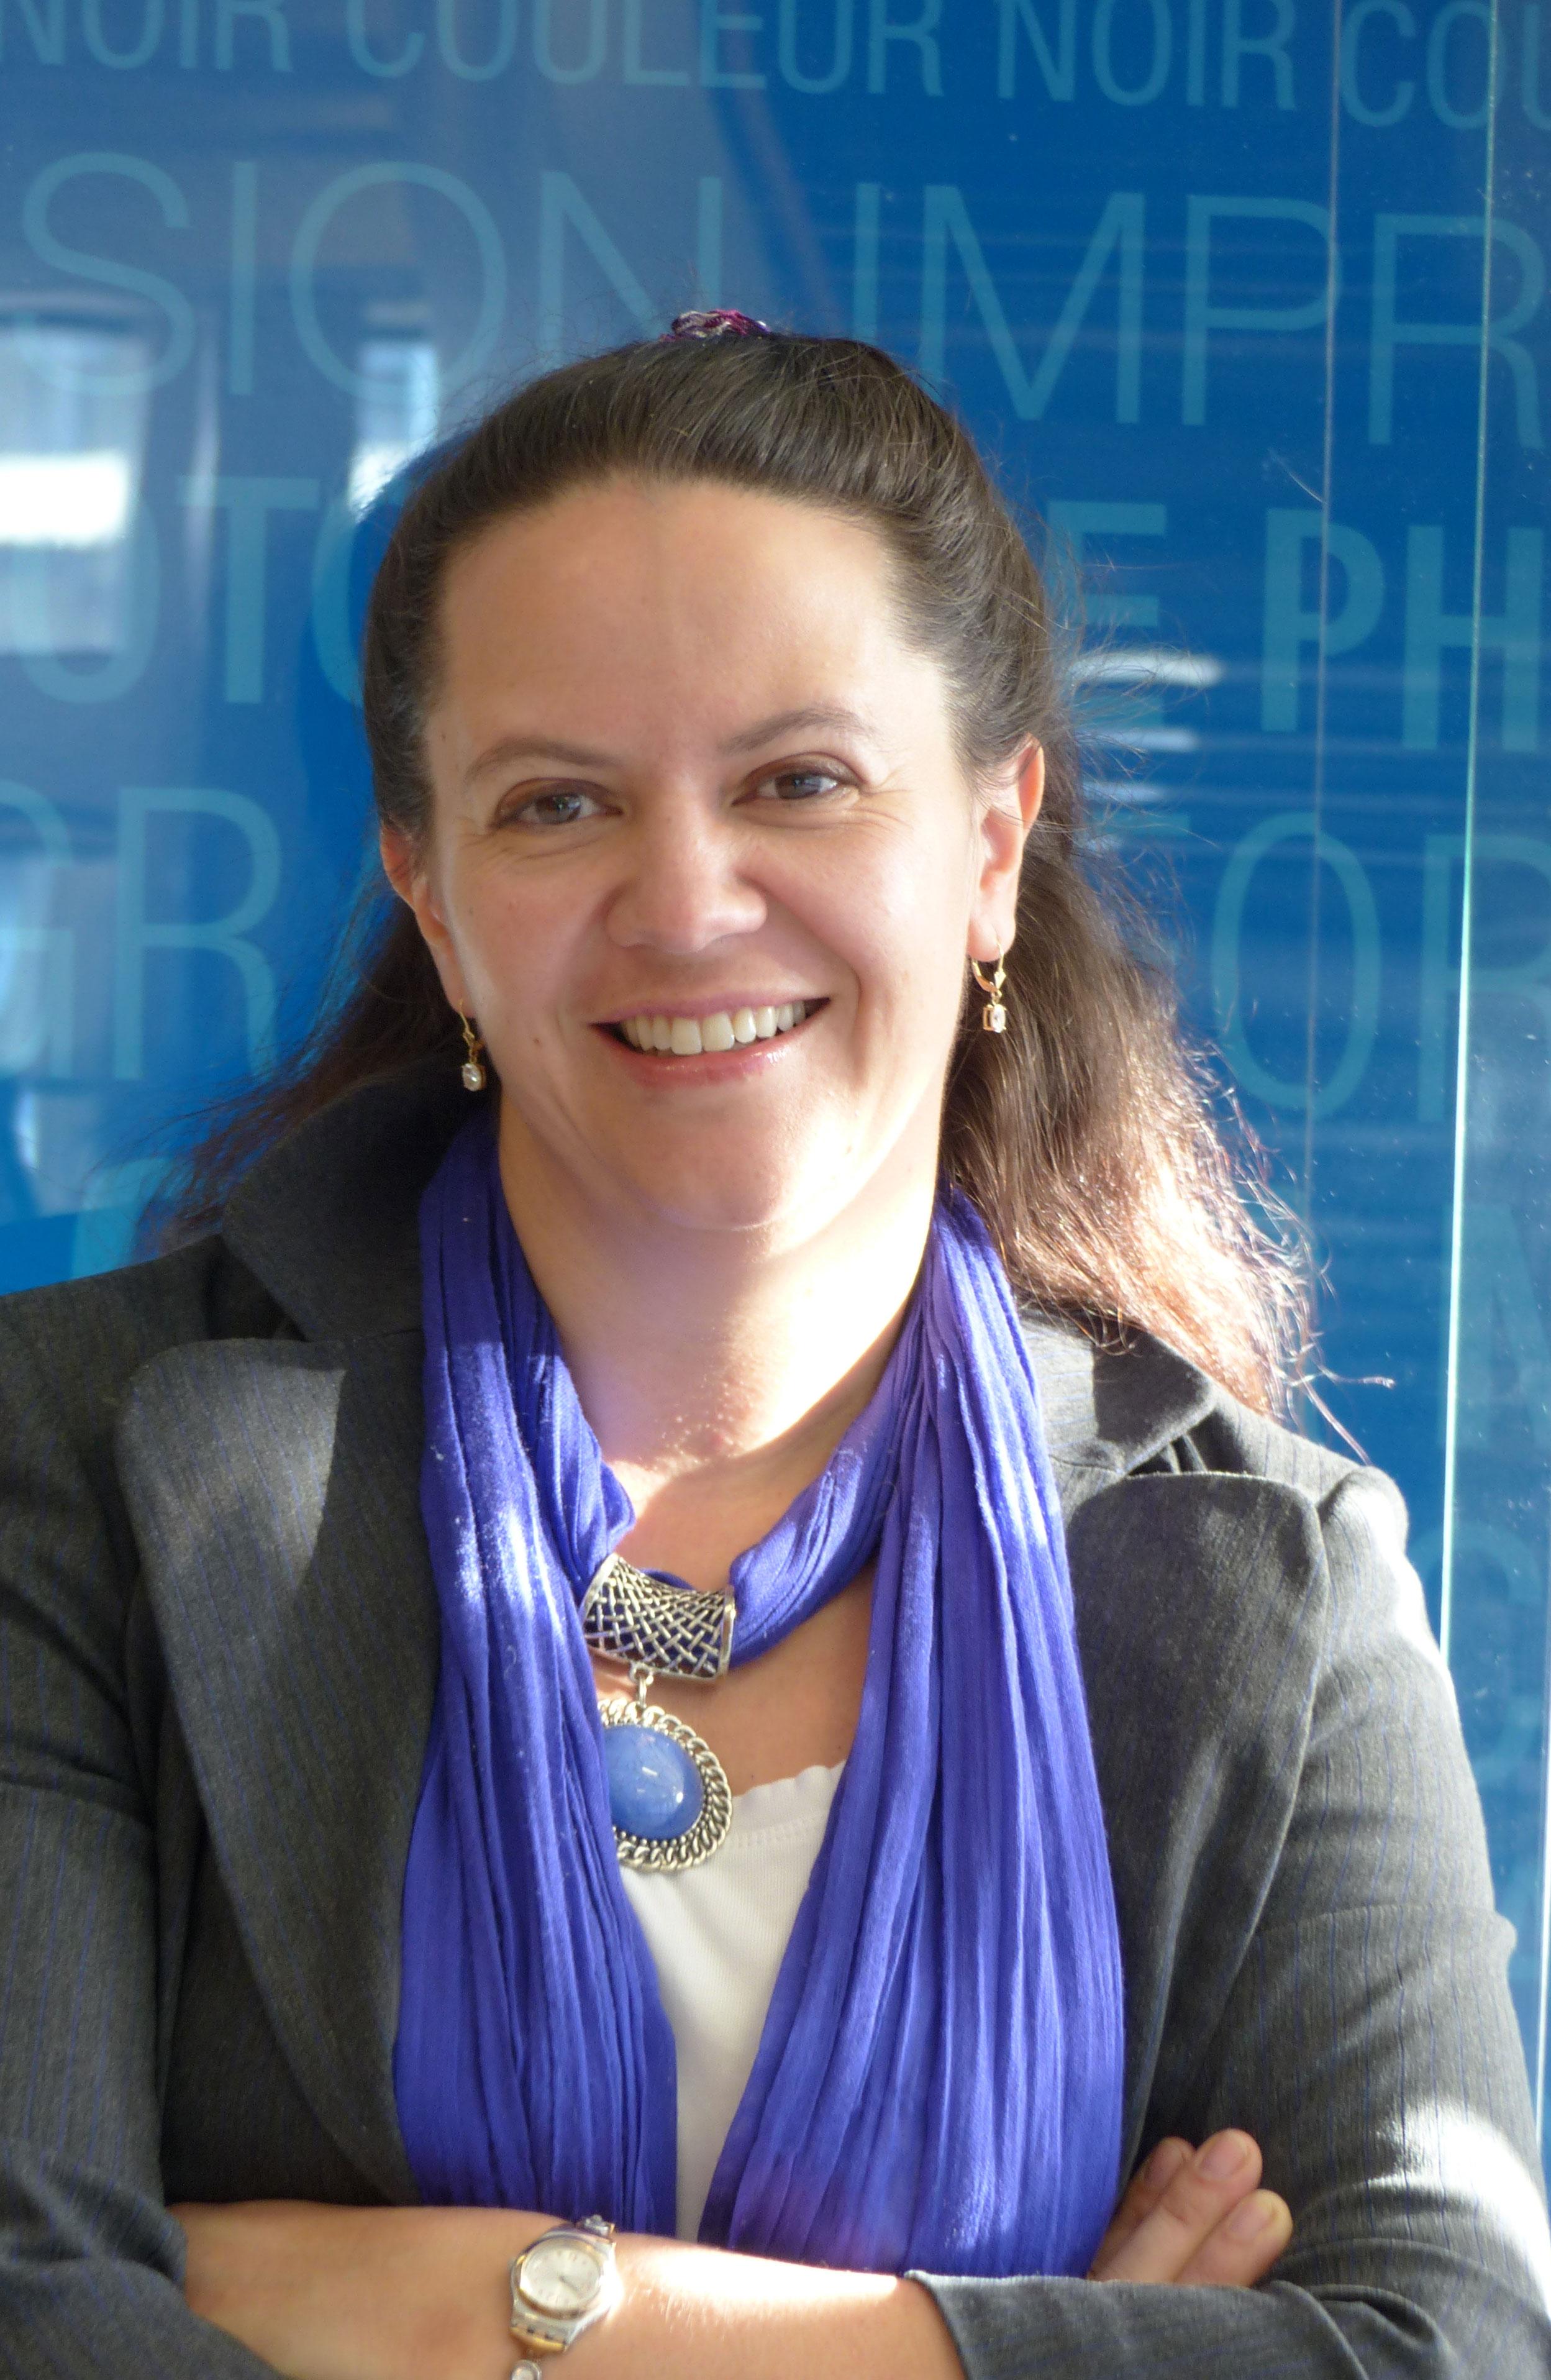 Anne Fonteneau